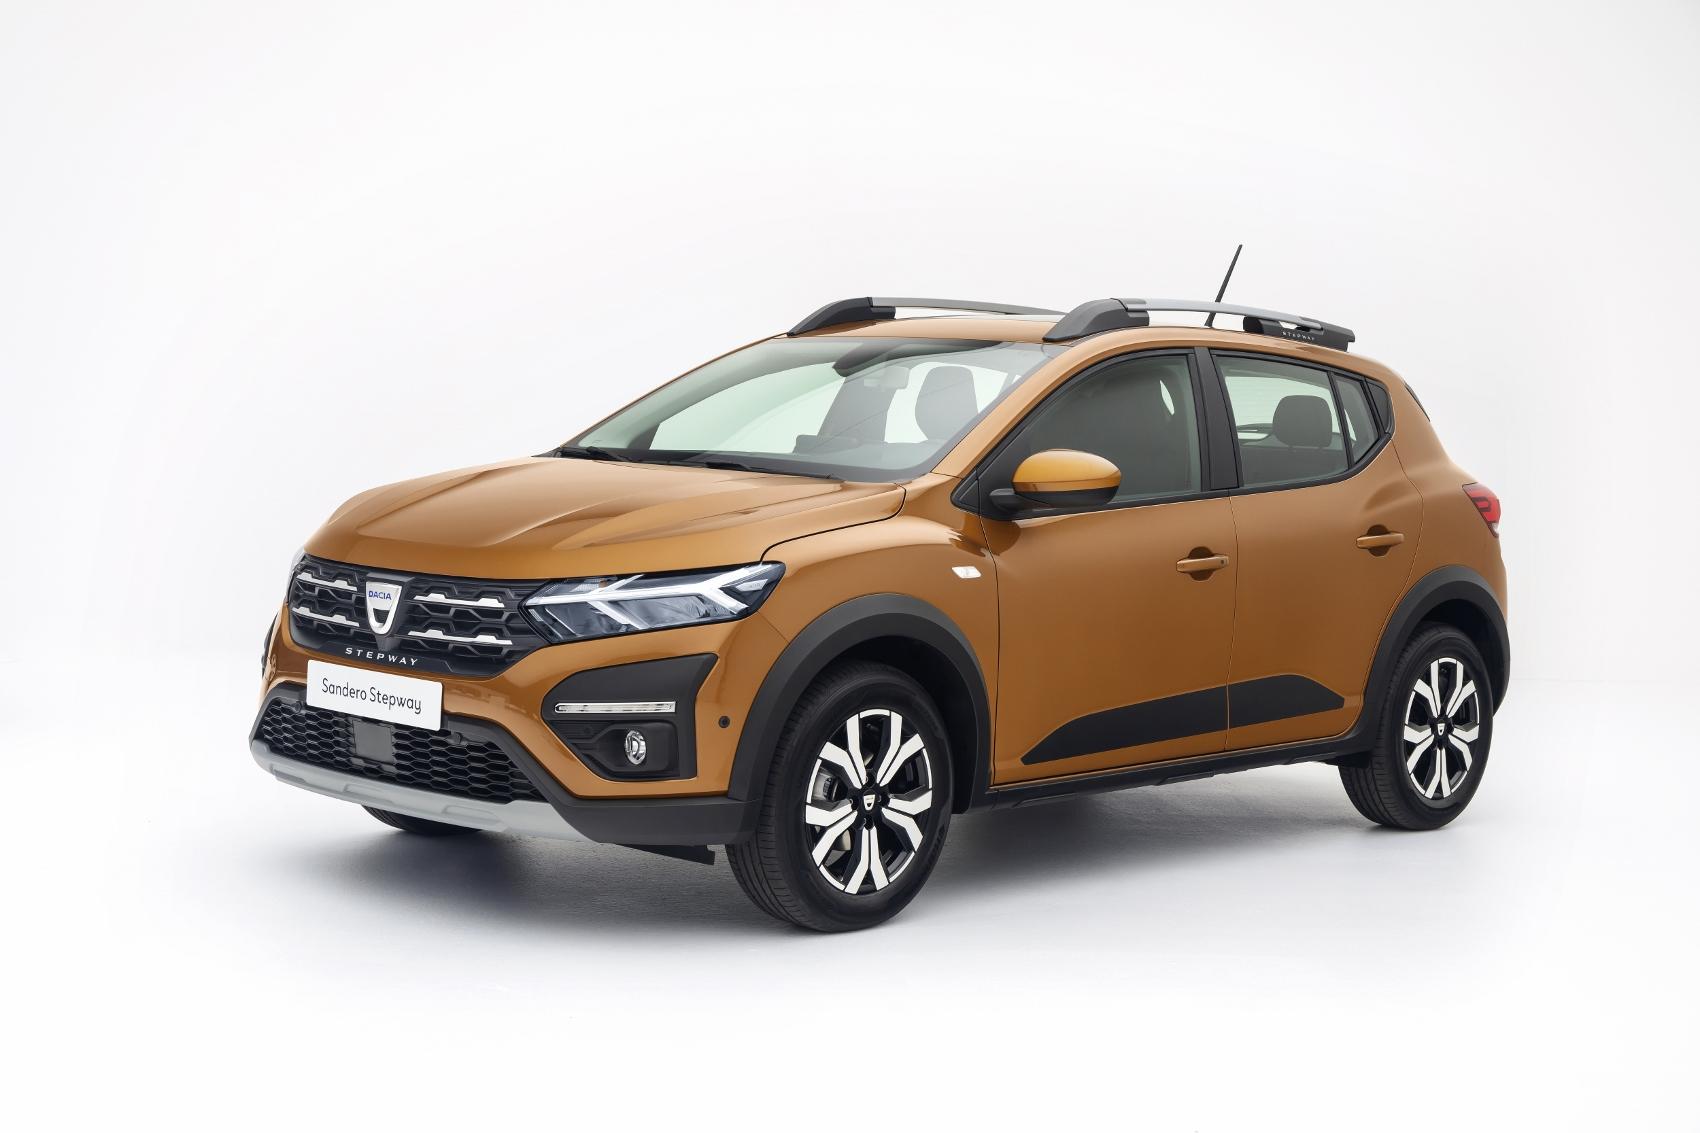 2020 - New Dacia SANDERO STEPWAY (2) (1700x1133)